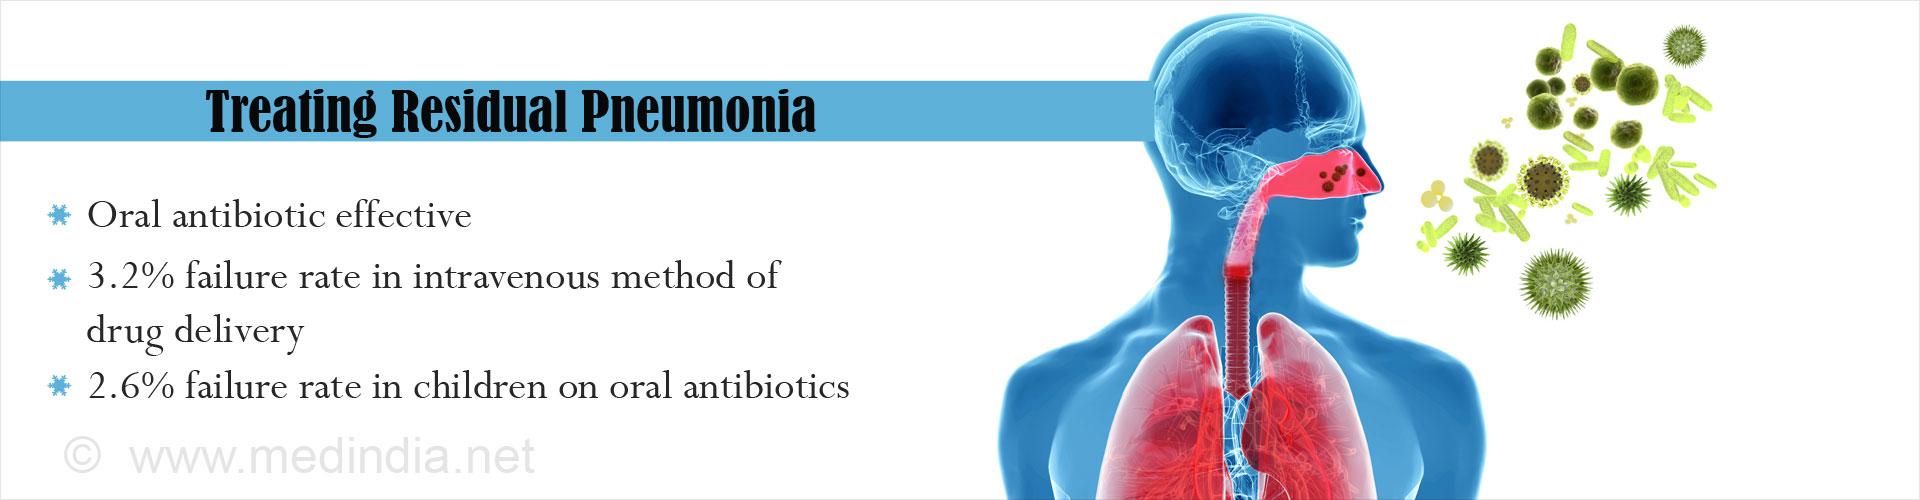 Complex Pneumonia Requires Simple Oral Antibiotic Therapy for Residual Disease